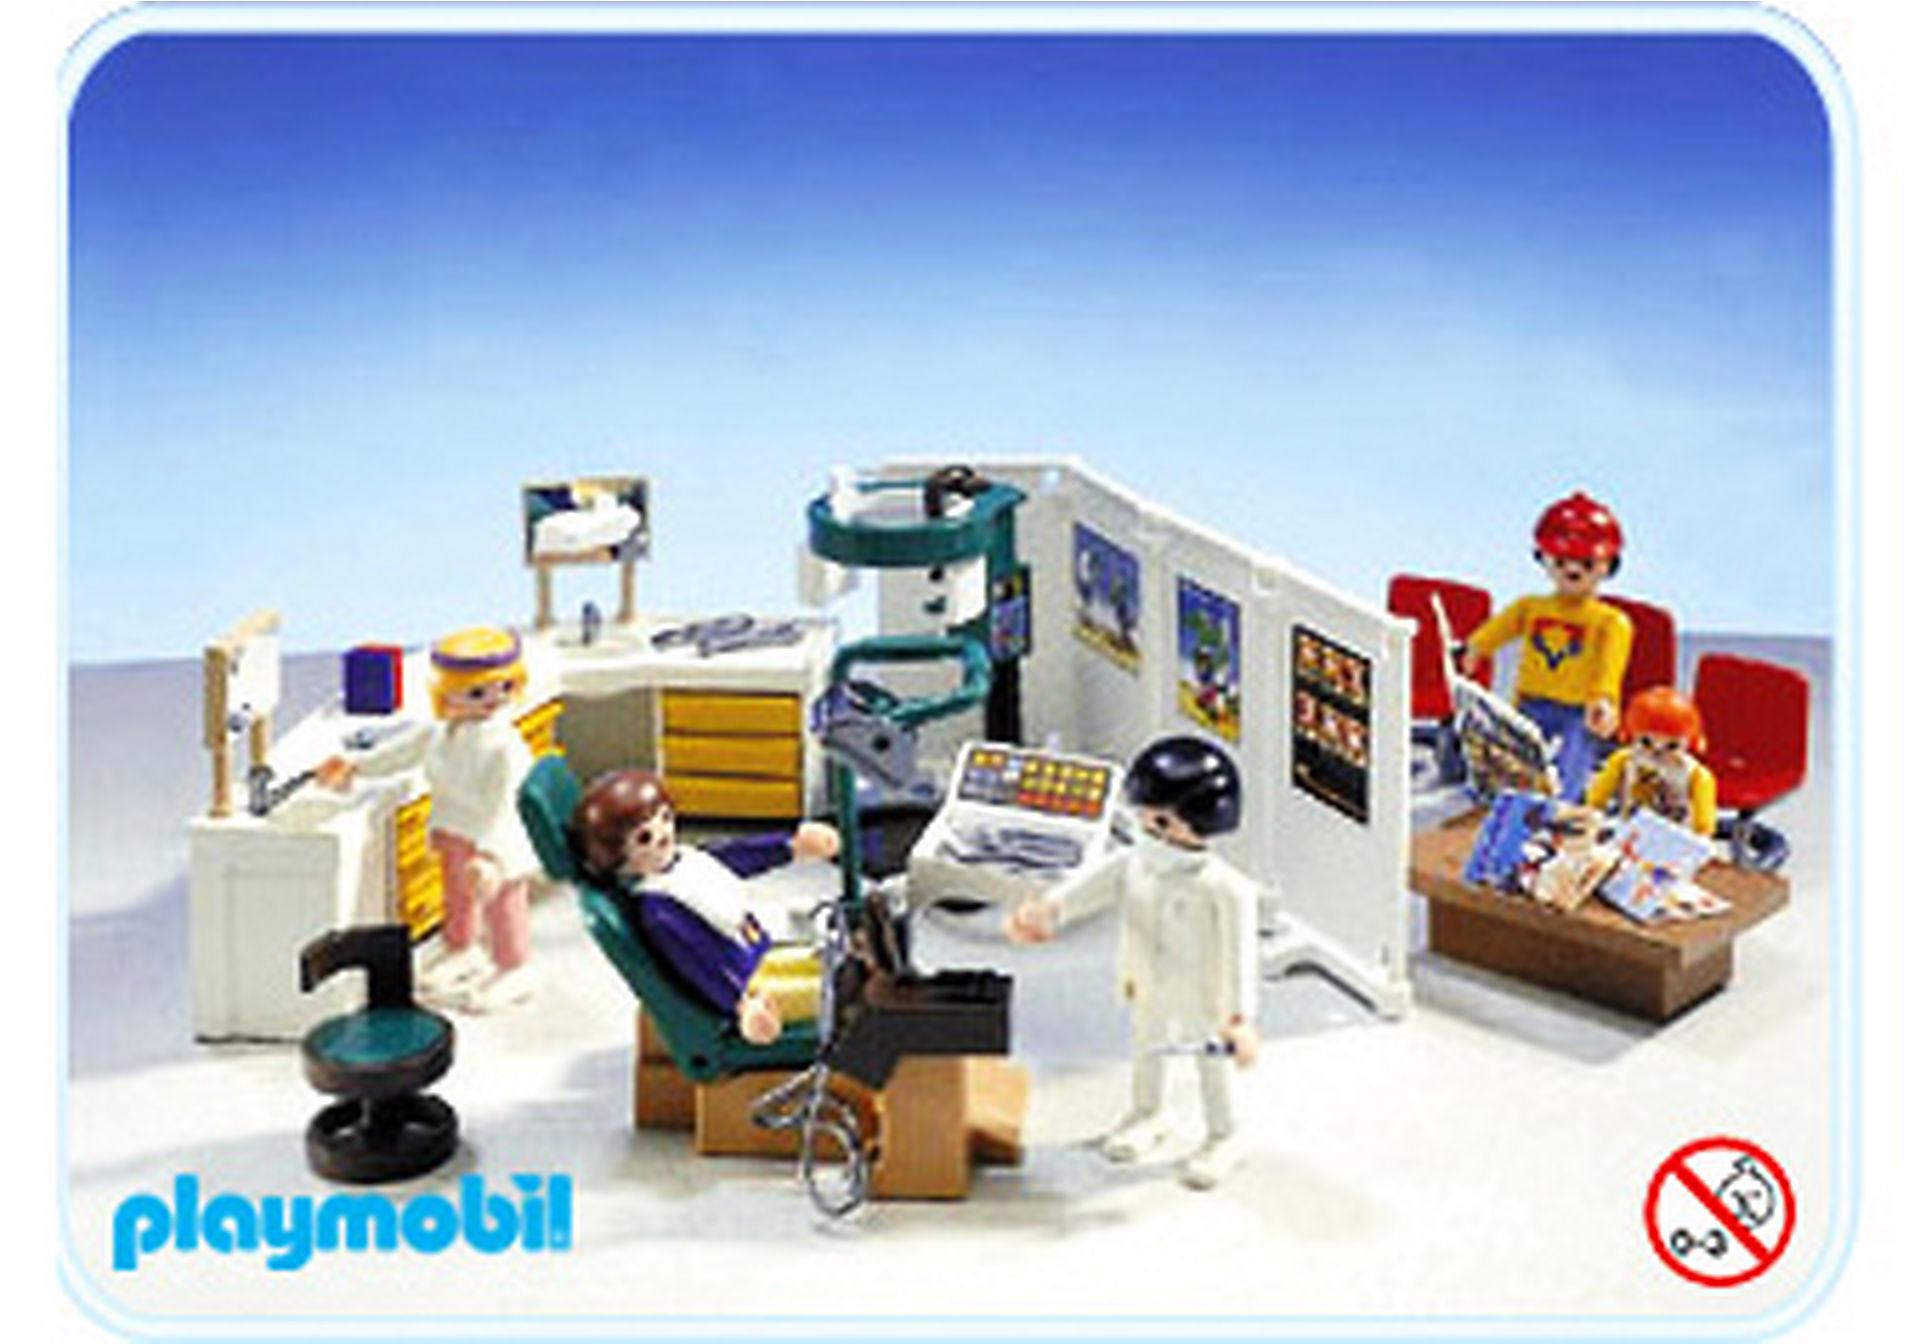 http://media.playmobil.com/i/playmobil/3762-A_product_detail/Zahnarzt-Praxis